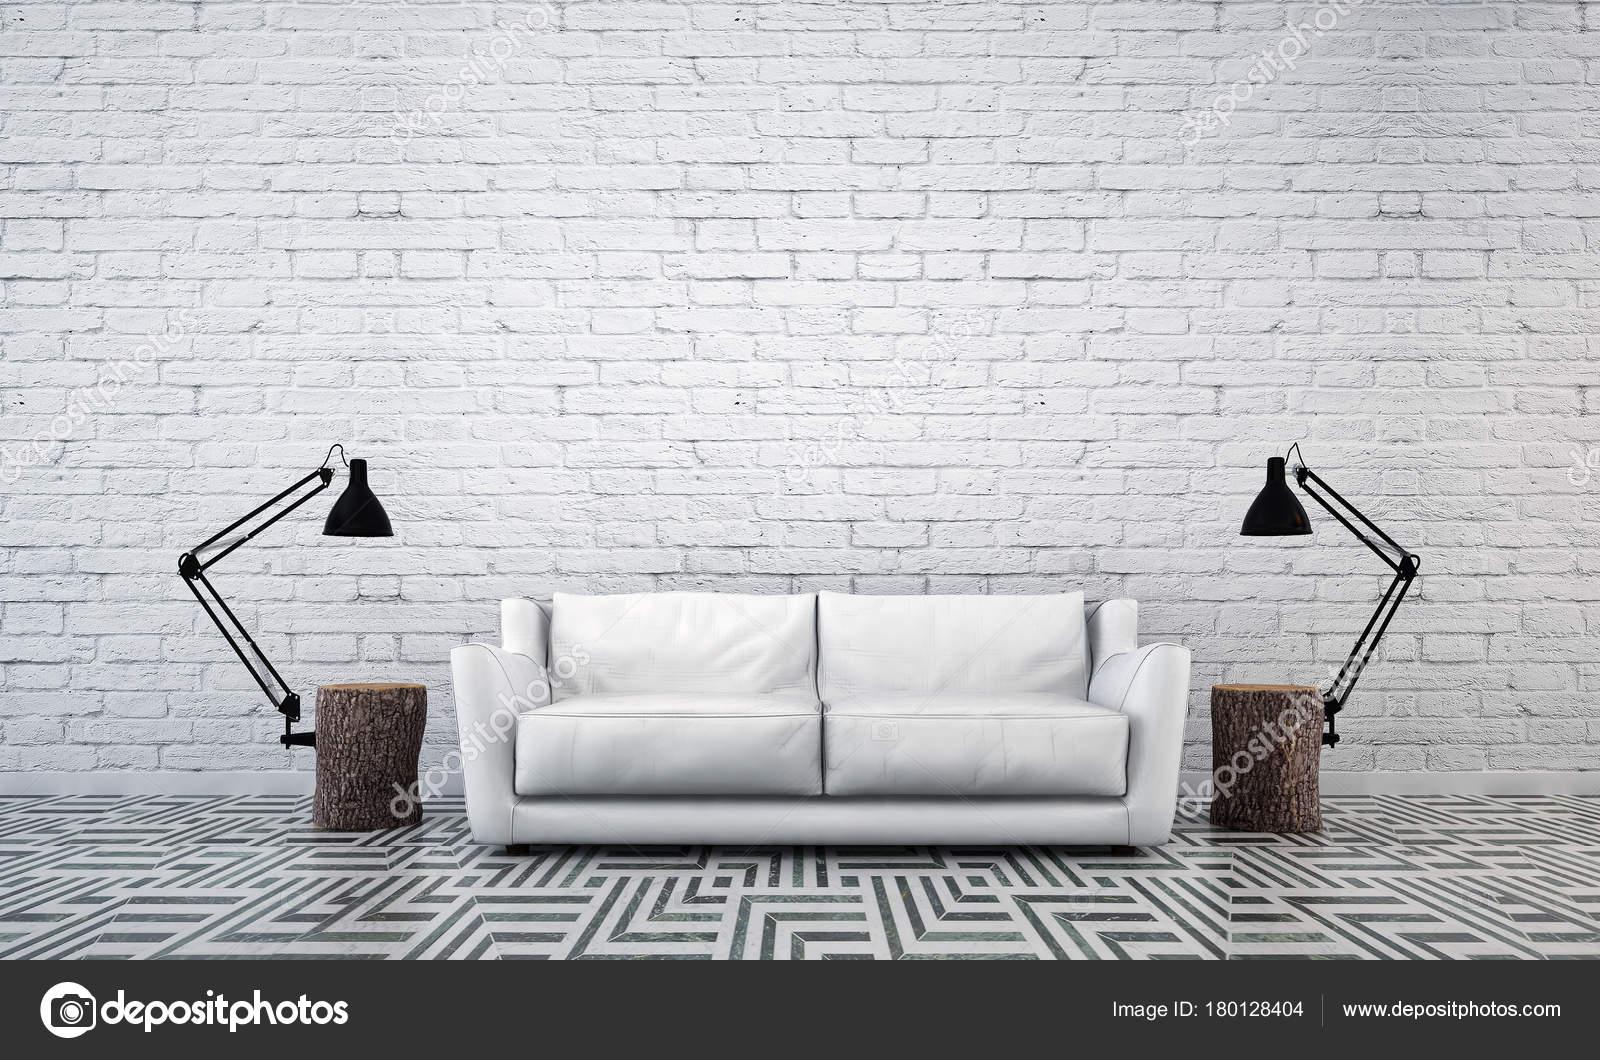 Het interieur design idee concept van moderne minimale woonkamer